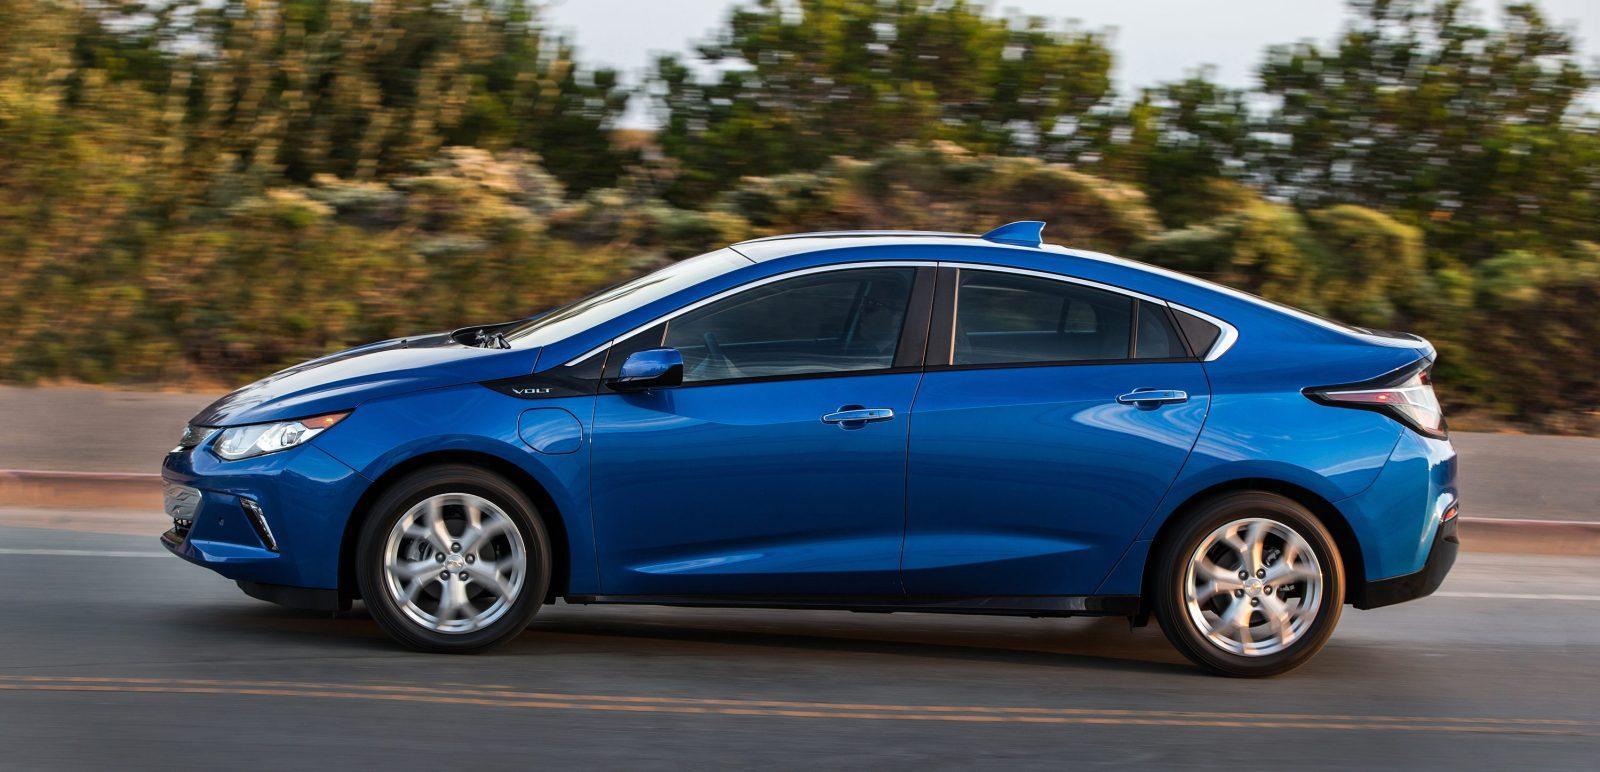 car hybrid volt in all blue news comparison chevrolet book kelley test plug latest the